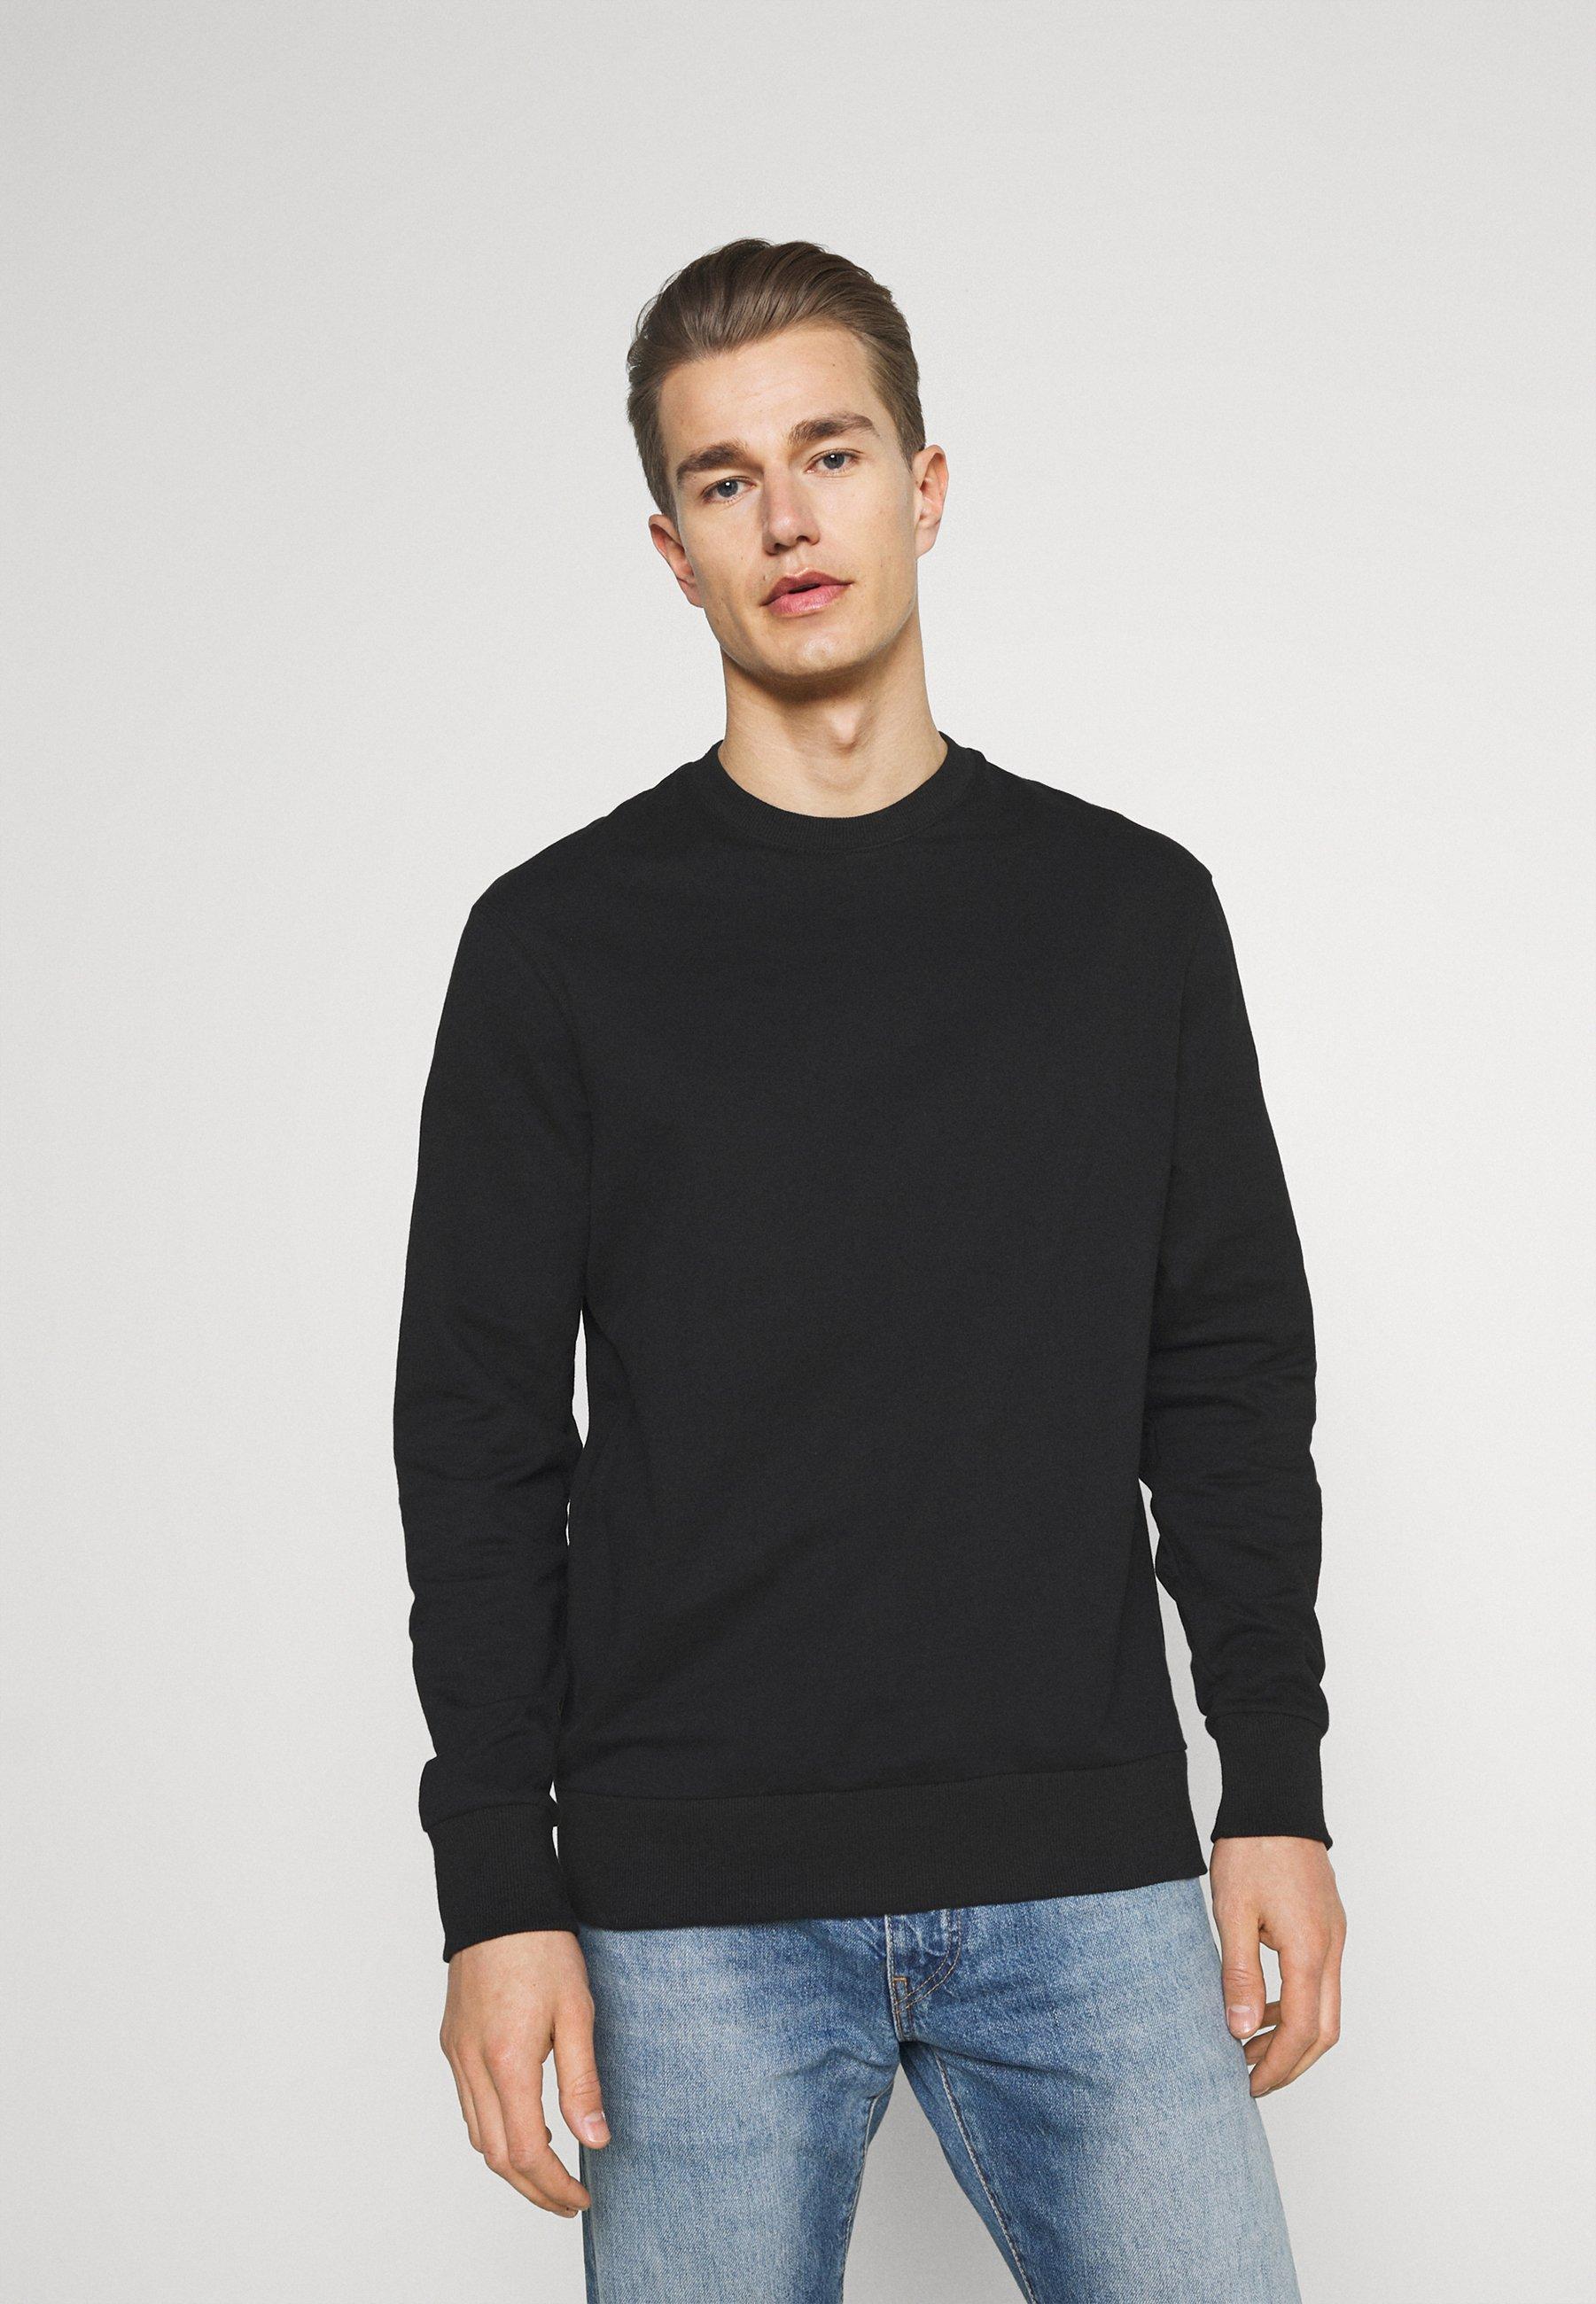 Homme CASUAL BÁSICA CAJA - Sweatshirt